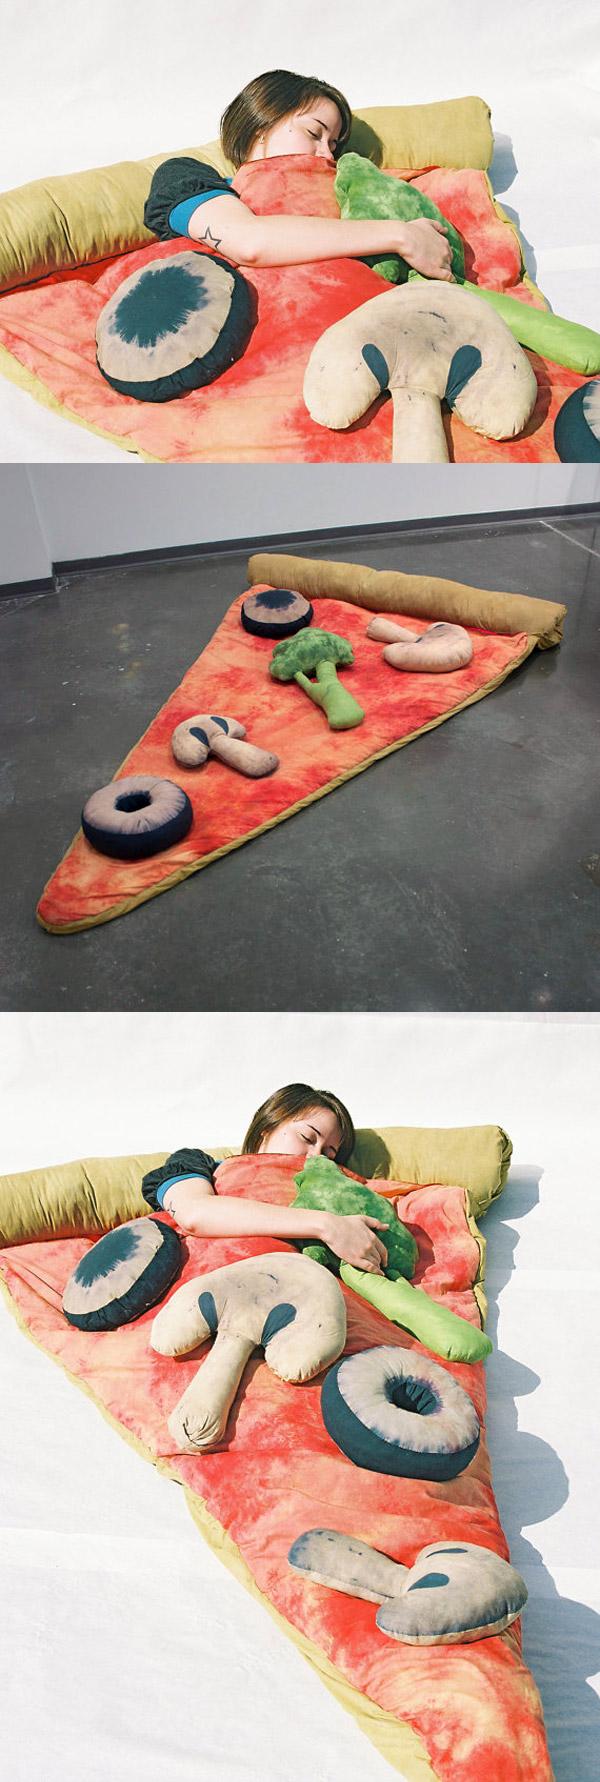 La cama-pizza